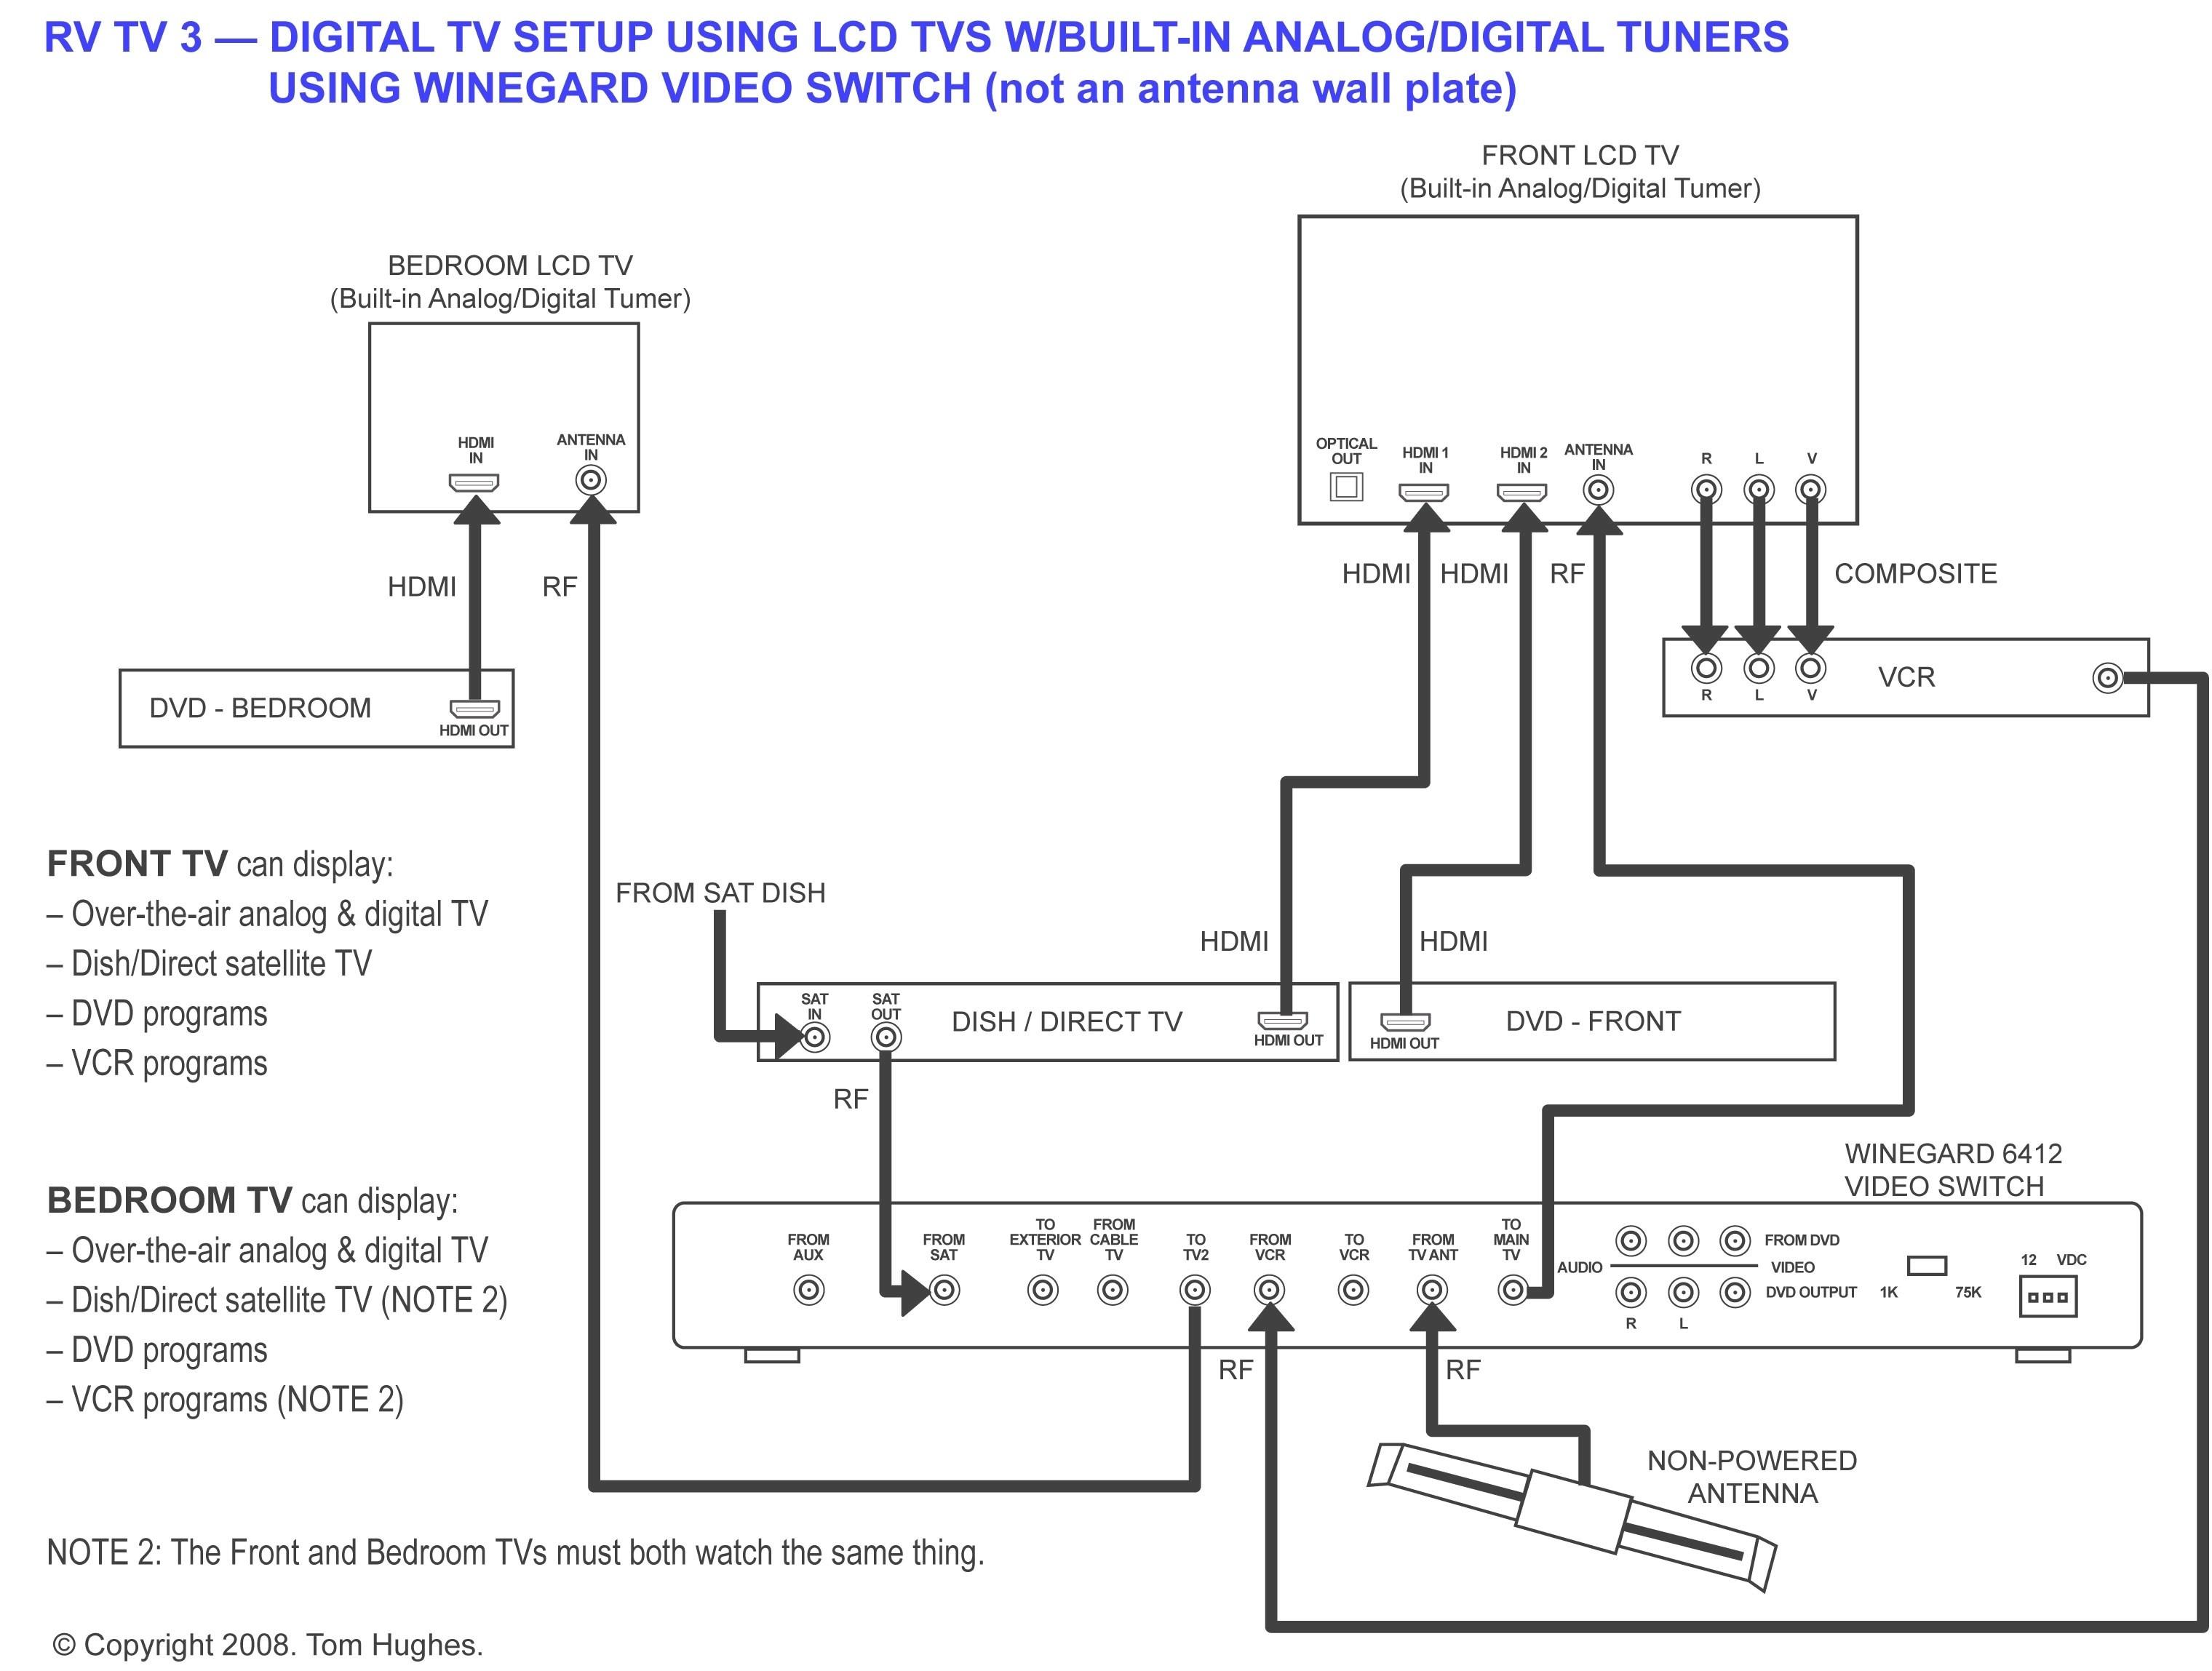 YT_4634] Direct Lift Wiring Diagram Schematic WiringGreas Garna Mohammedshrine Librar Wiring 101